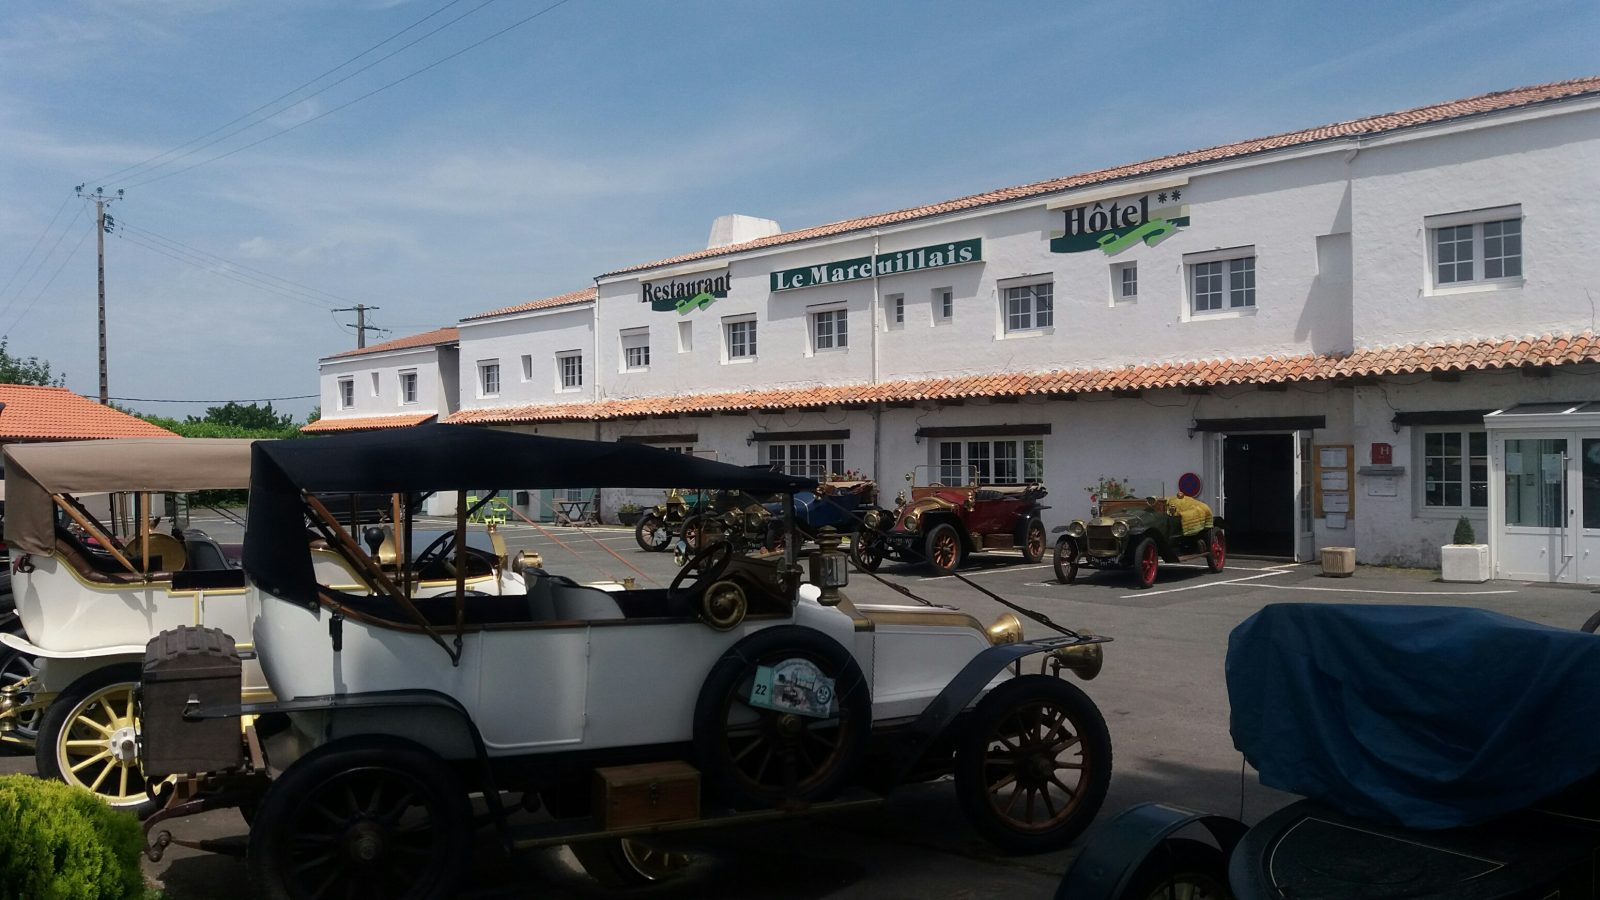 hotel-restaurant-le-mareuillais